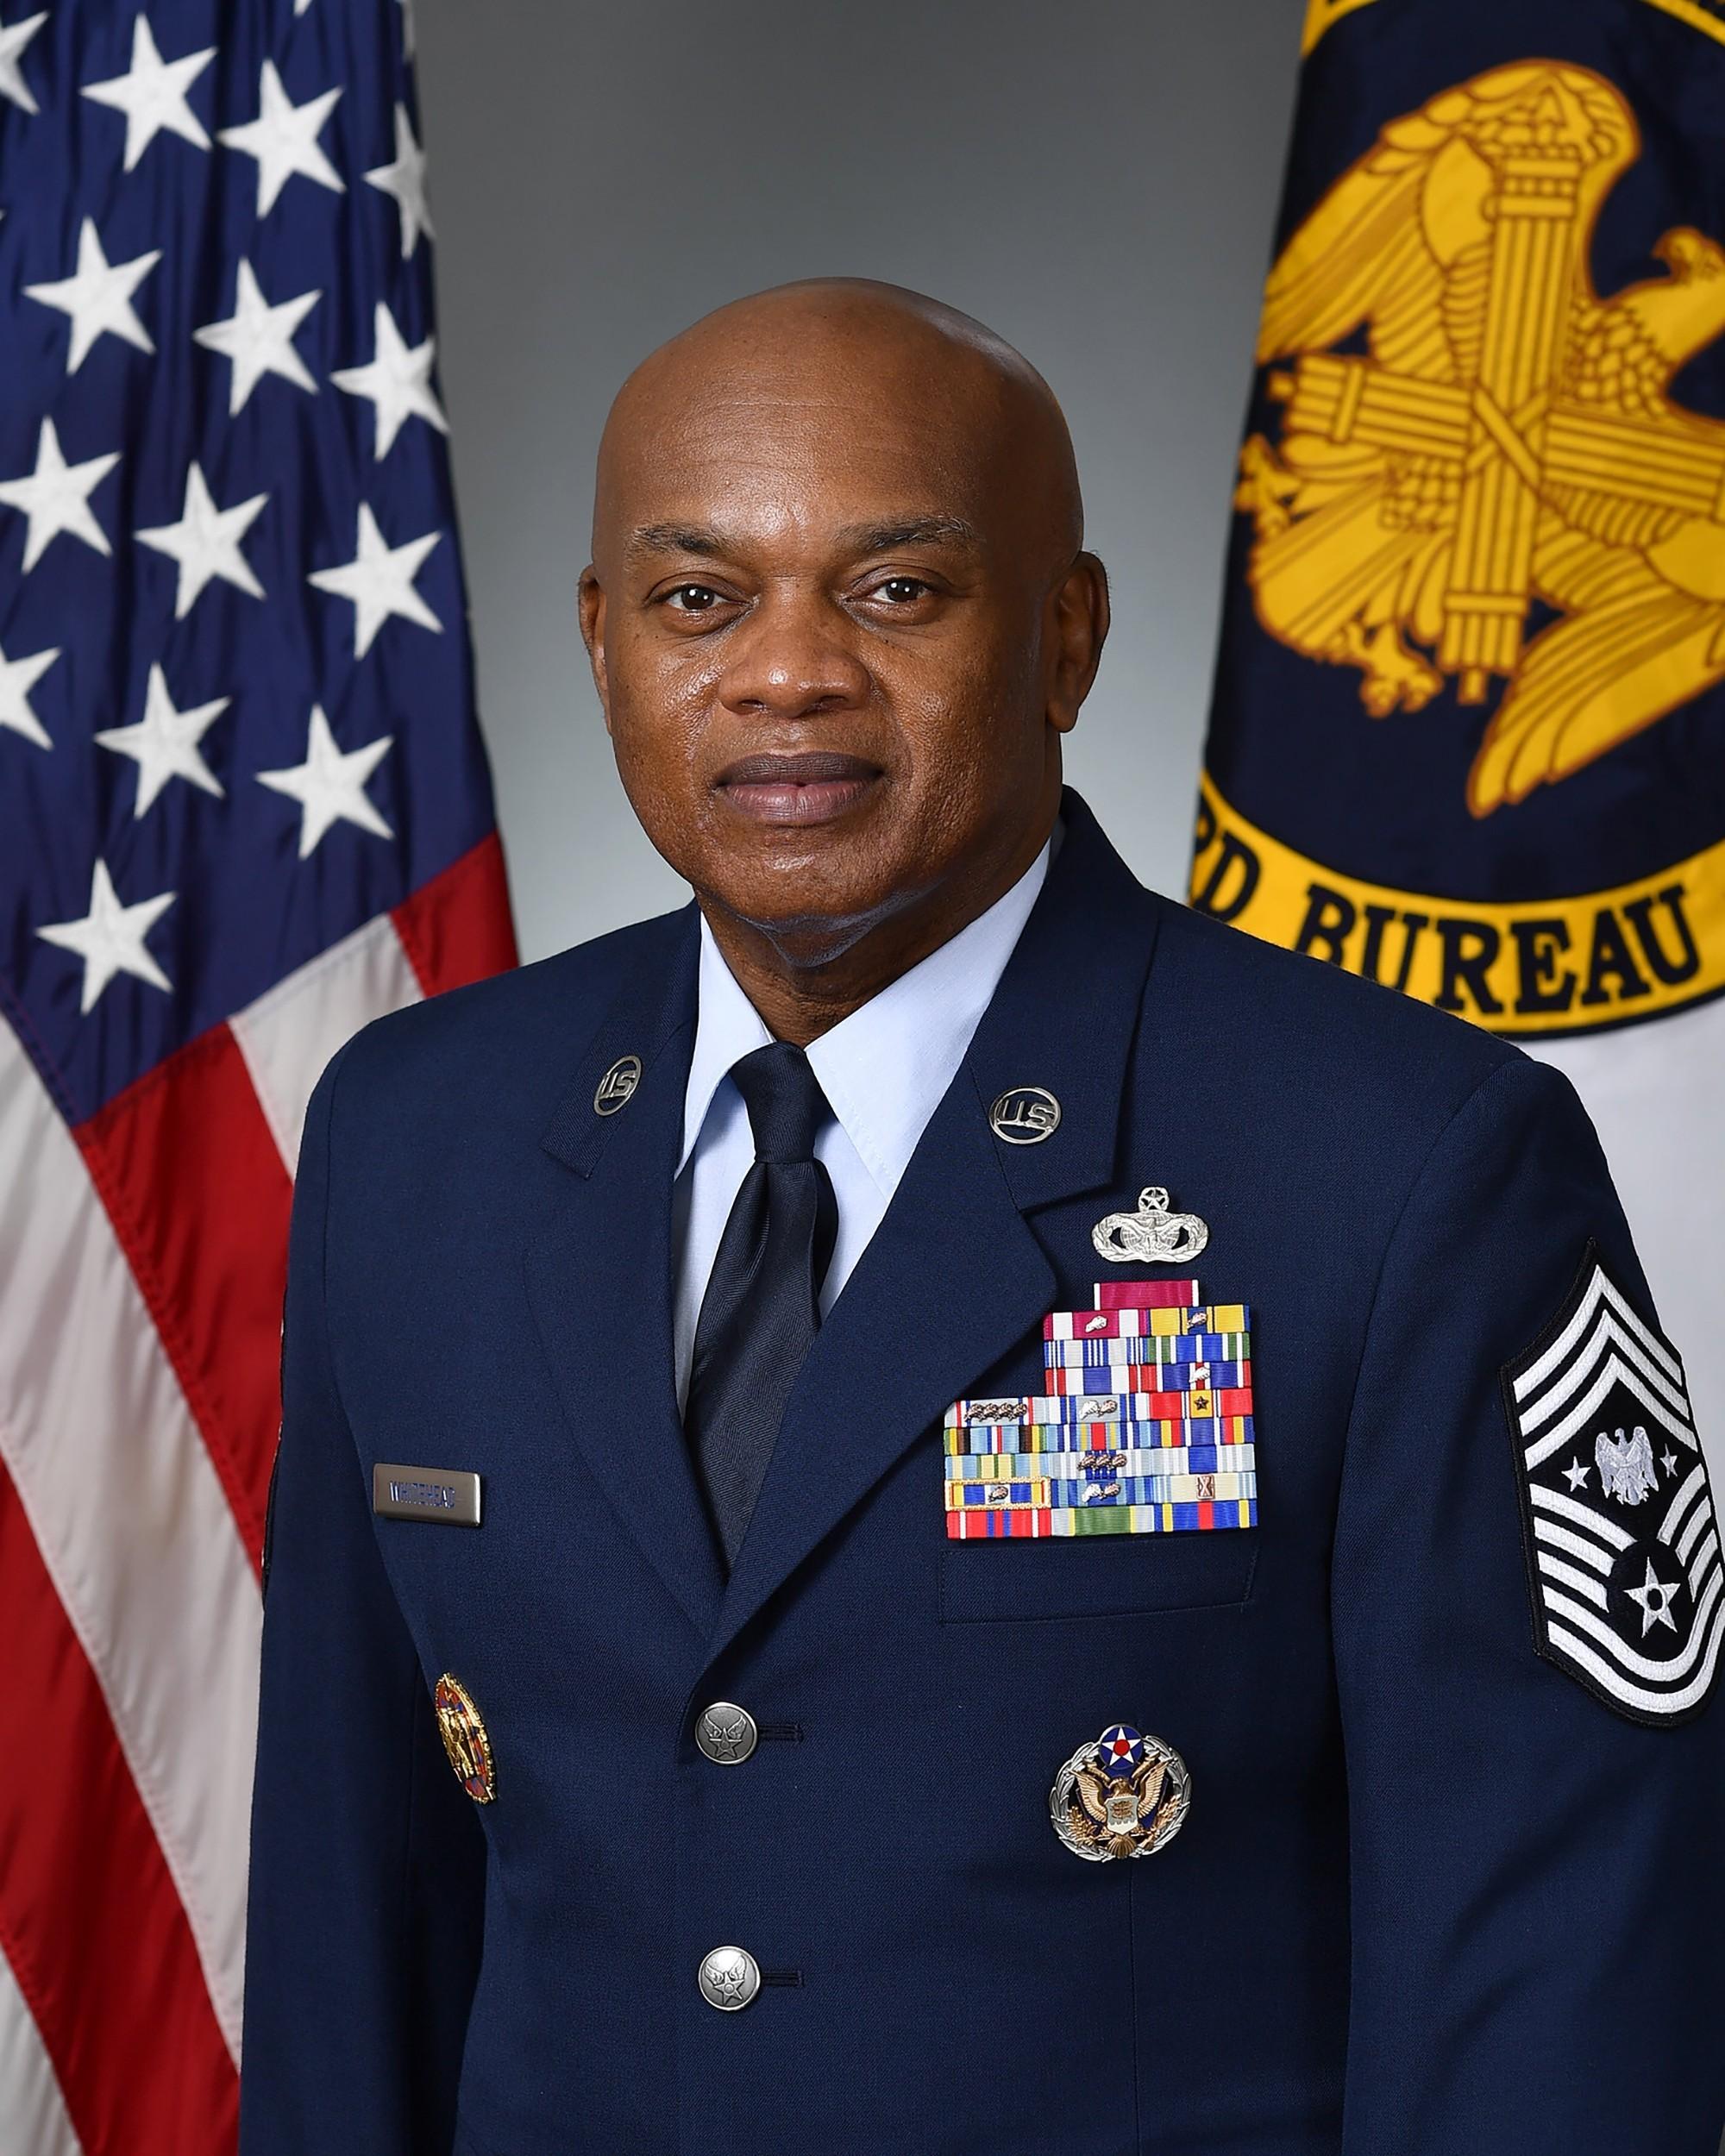 Sgt. Tony L. Whitehead